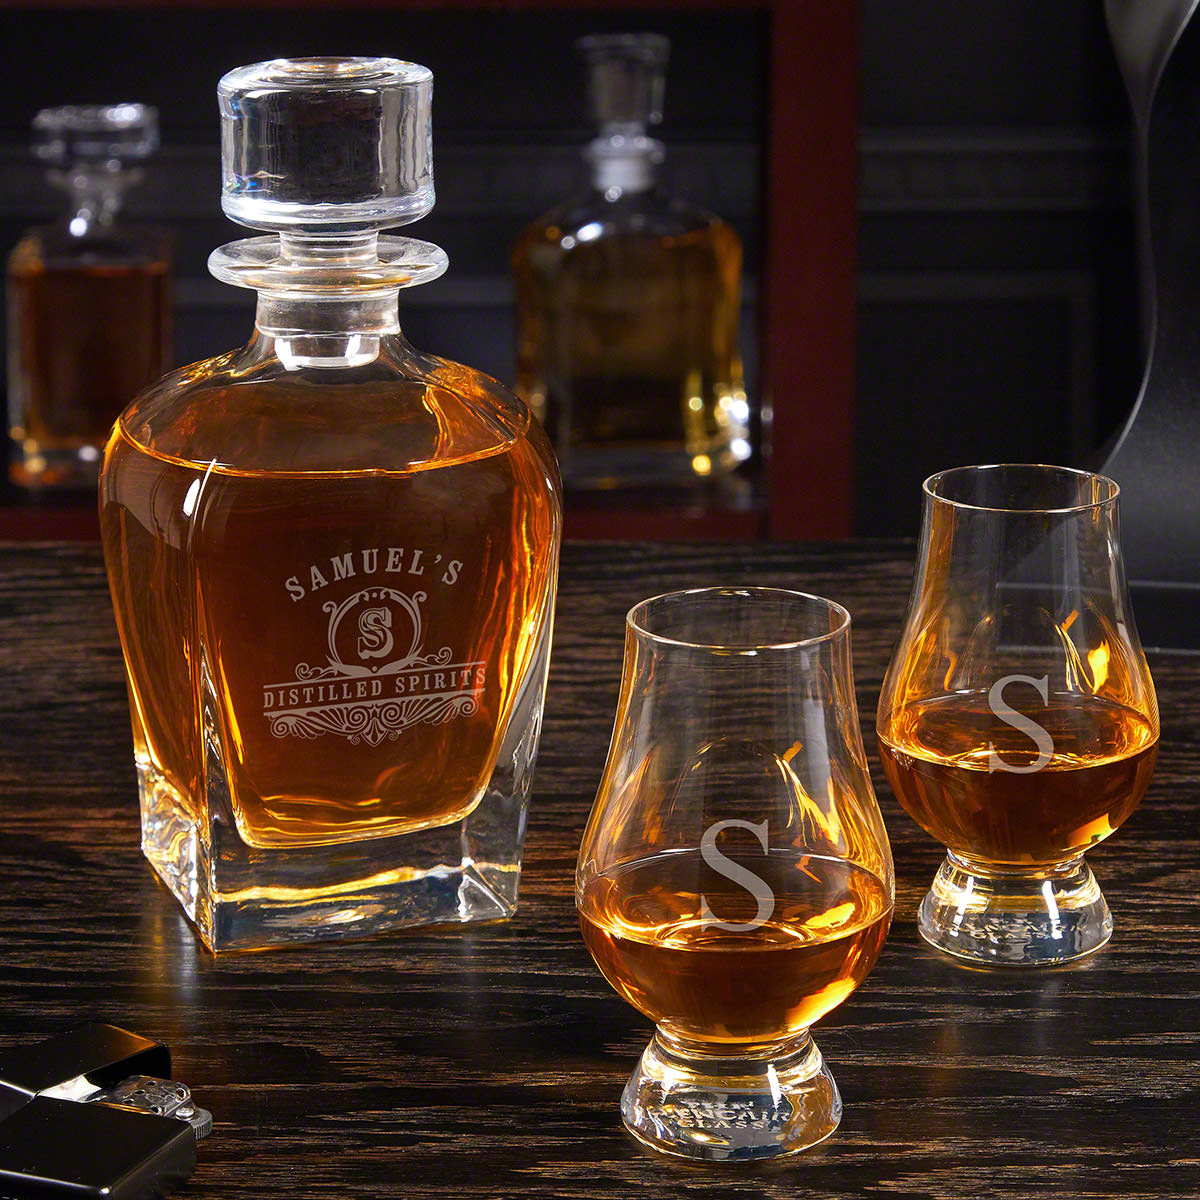 Carraway Engraved Draper Whiskey Decanter Set with Glencairn Glasses